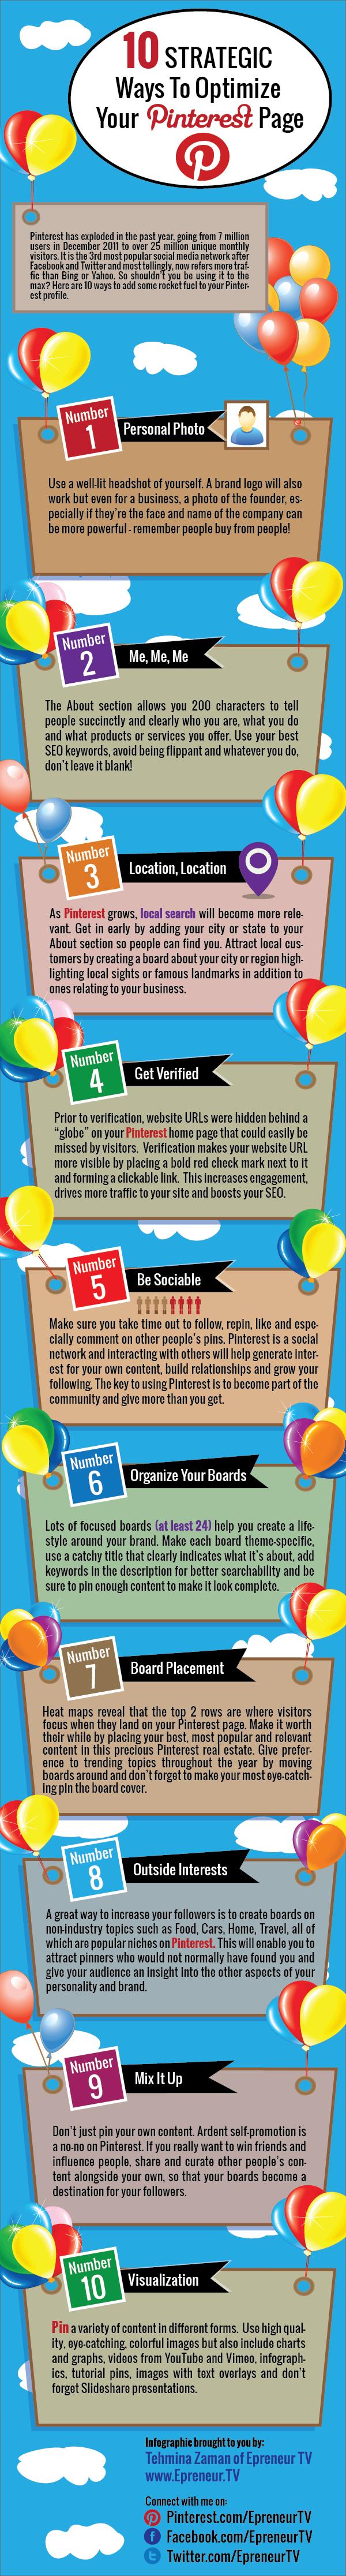 10 Ways To Optimize Your Pinterest Profile